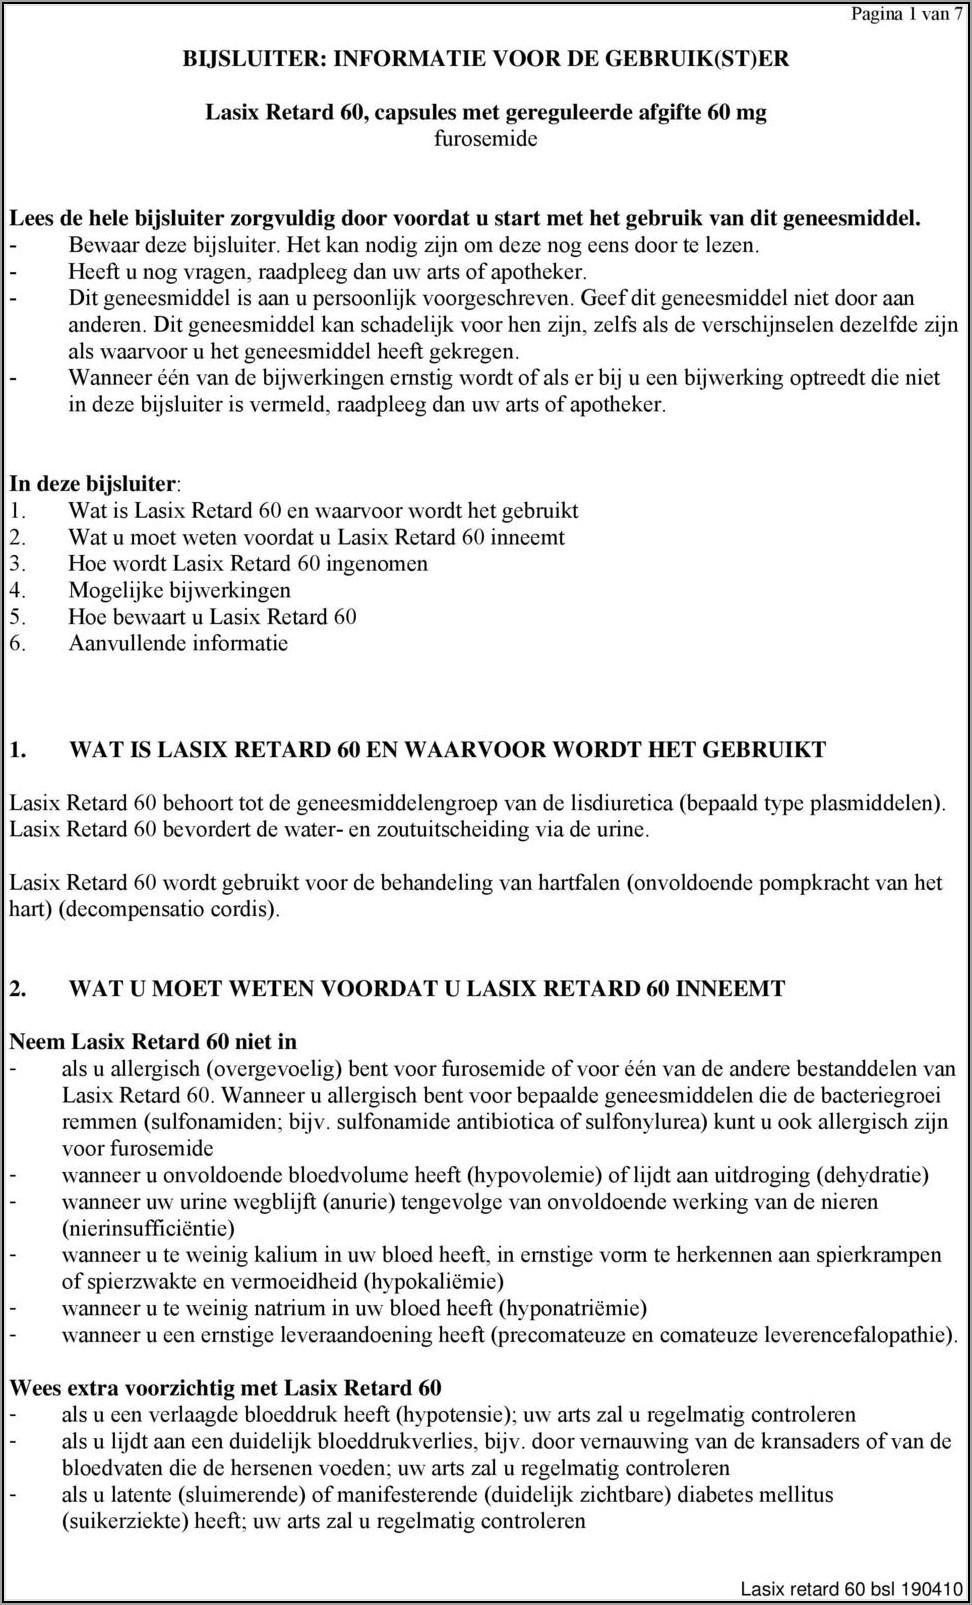 Xubex Application Form